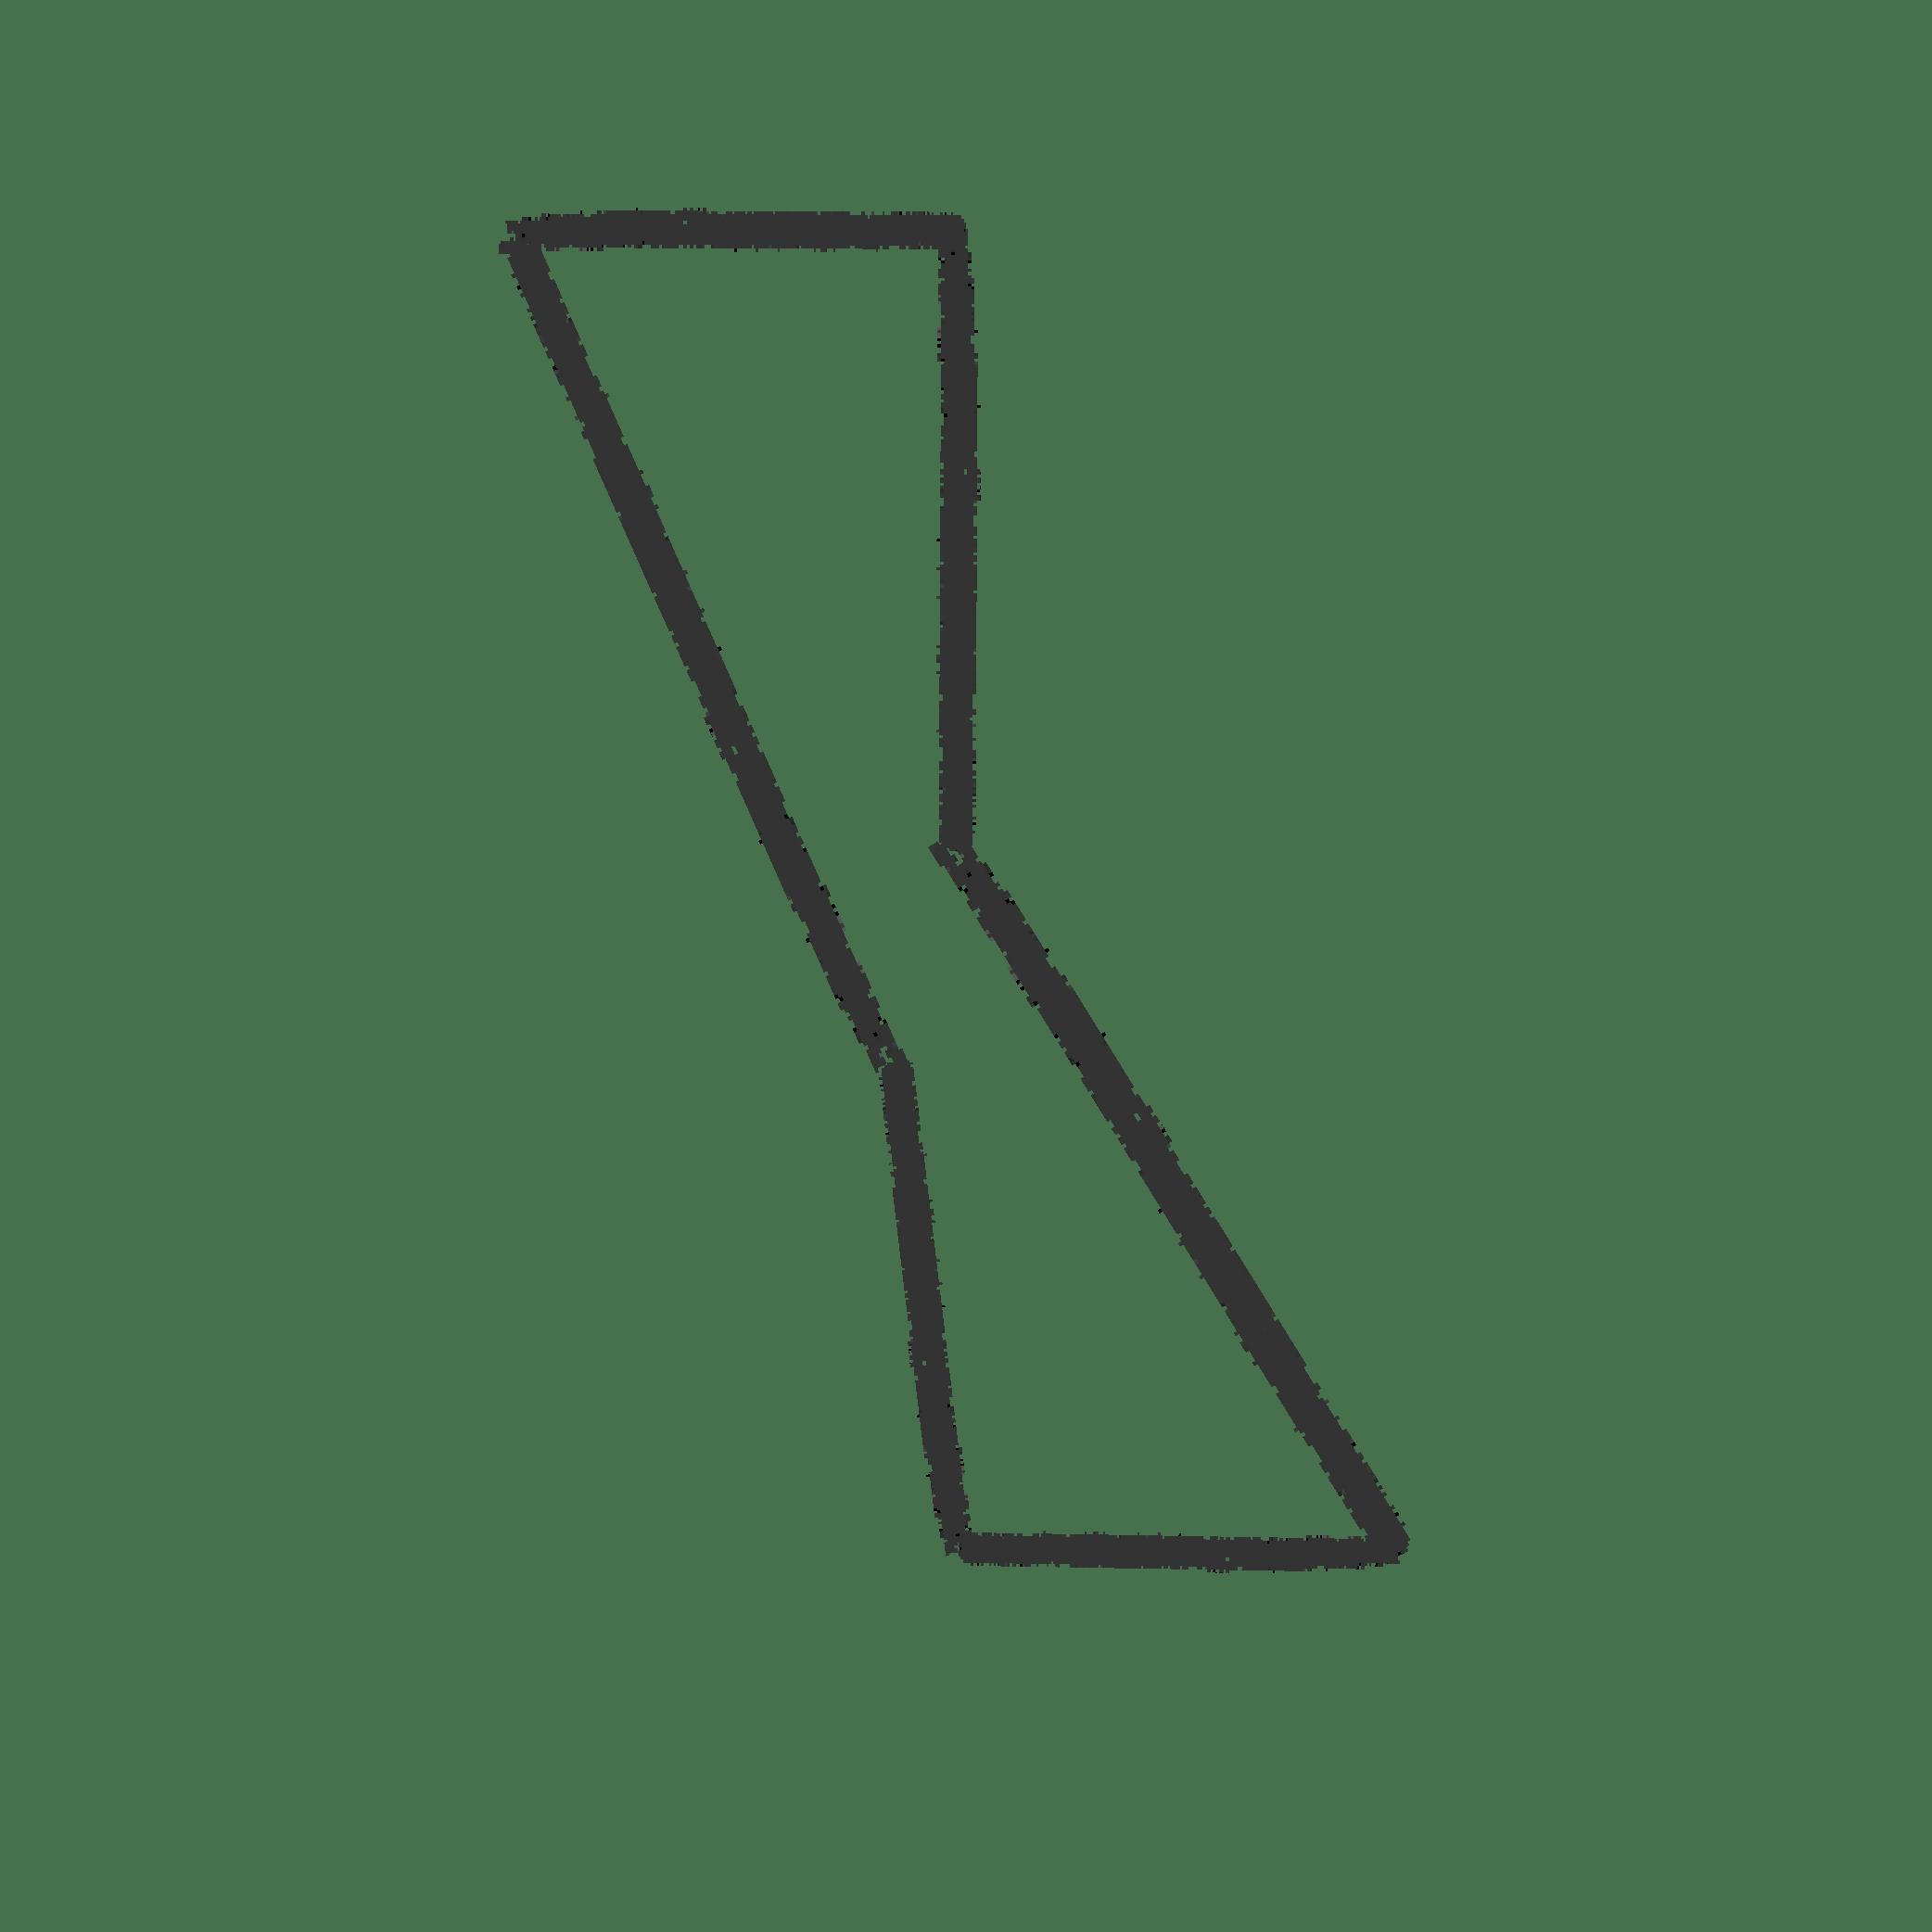 The hourglass in the Zeitgeist logo